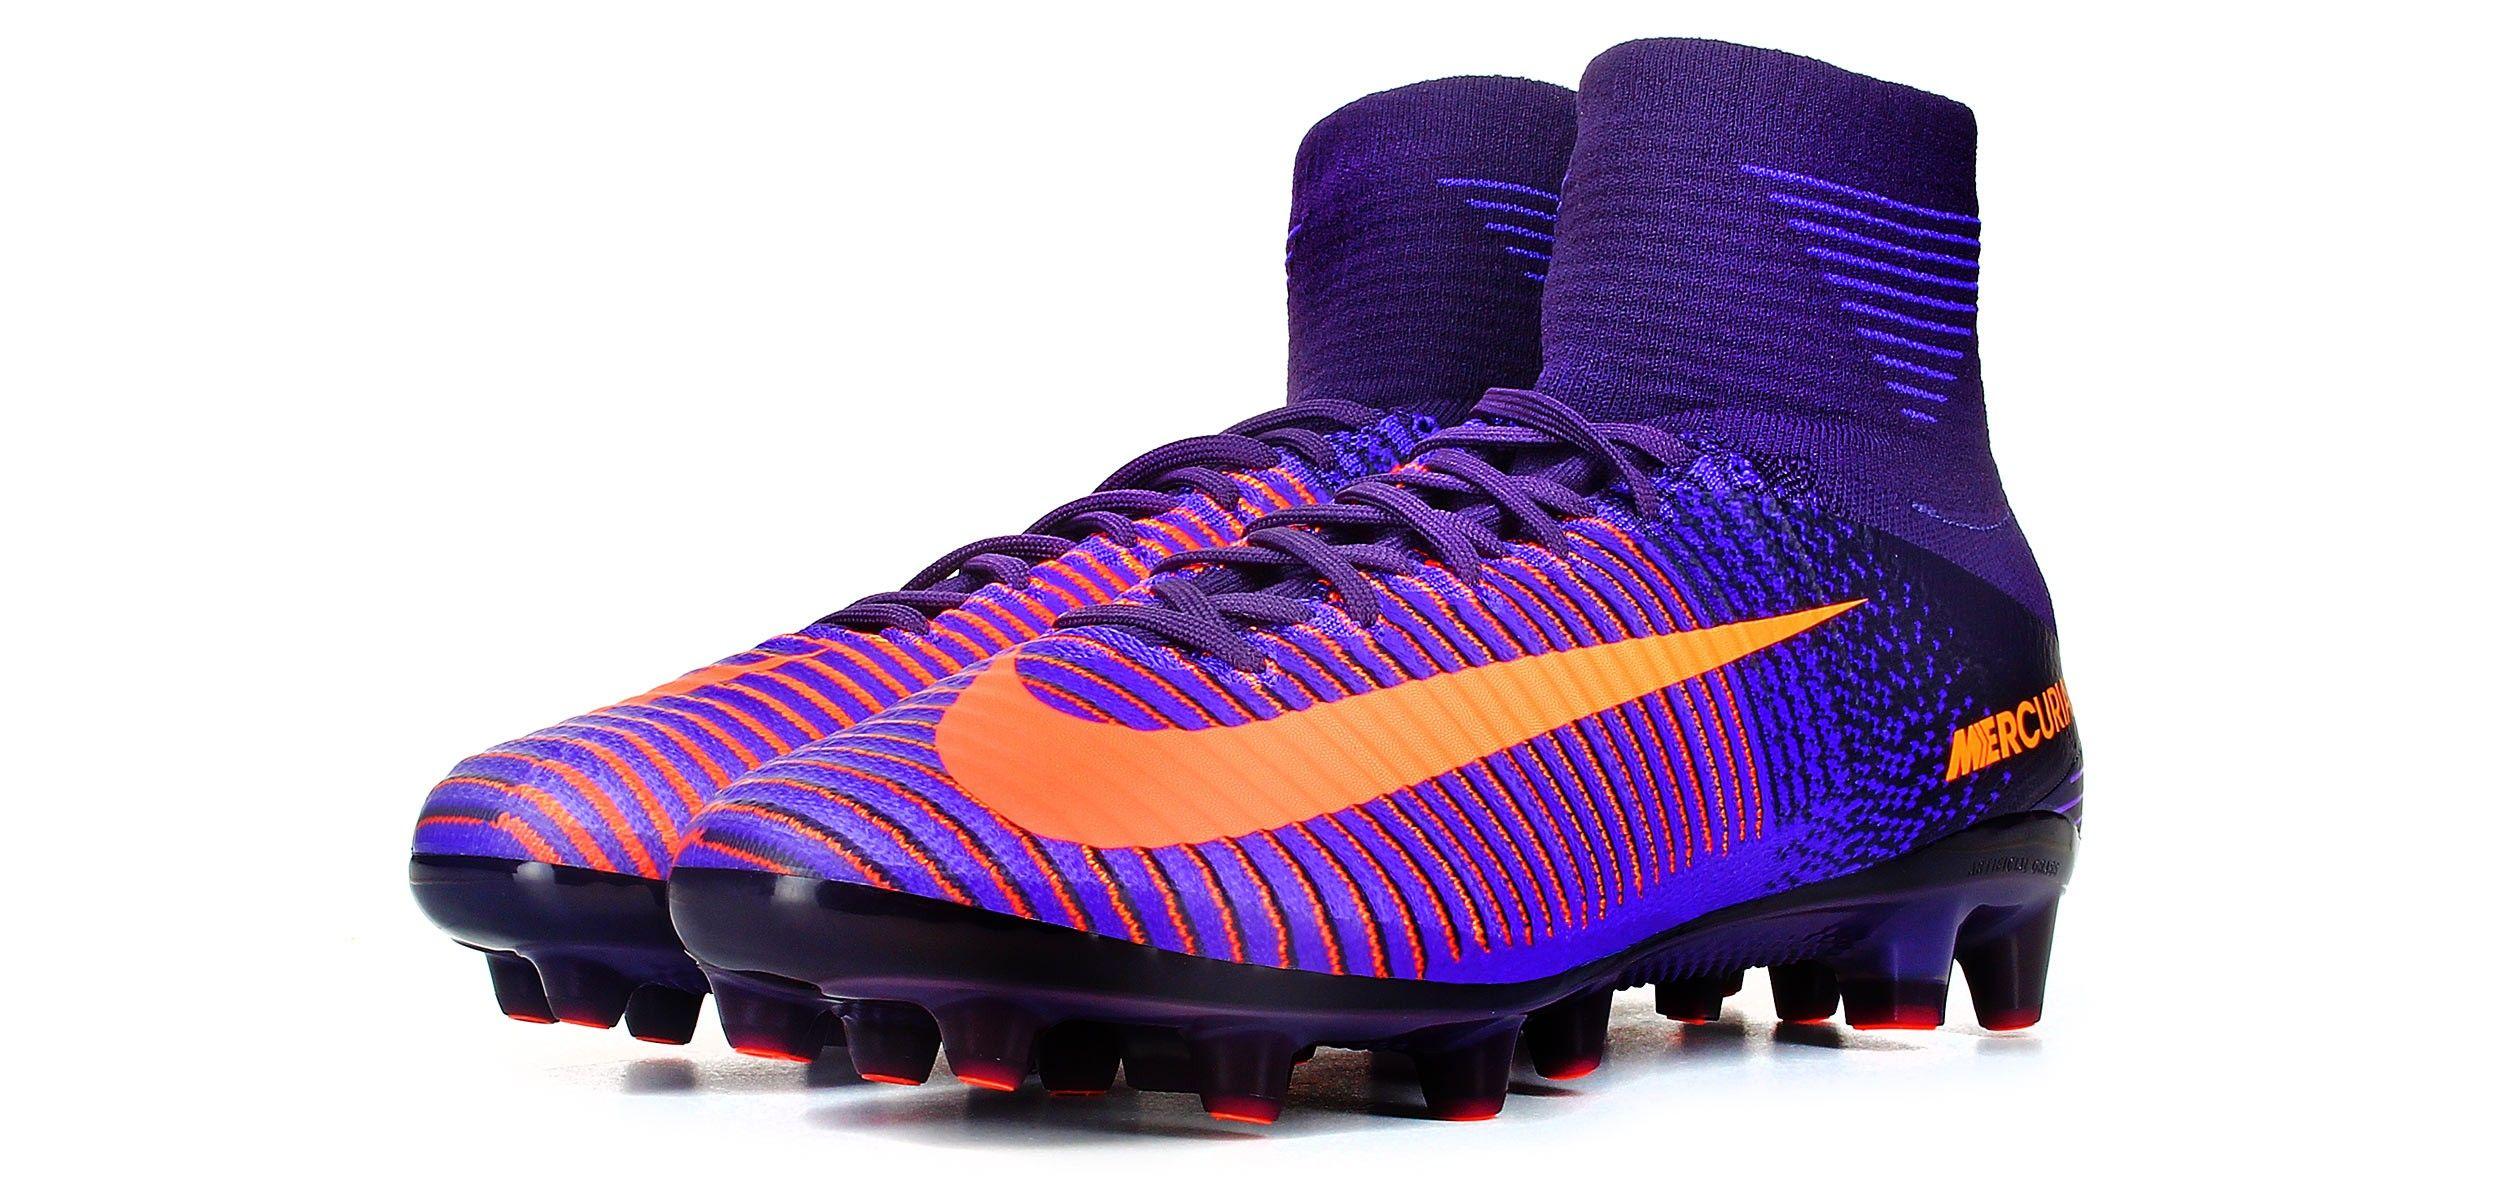 Botas de fútbol Nike Mercurial Superfly V AG-PRO - Púrpura Dynasty /  Naranja Bright